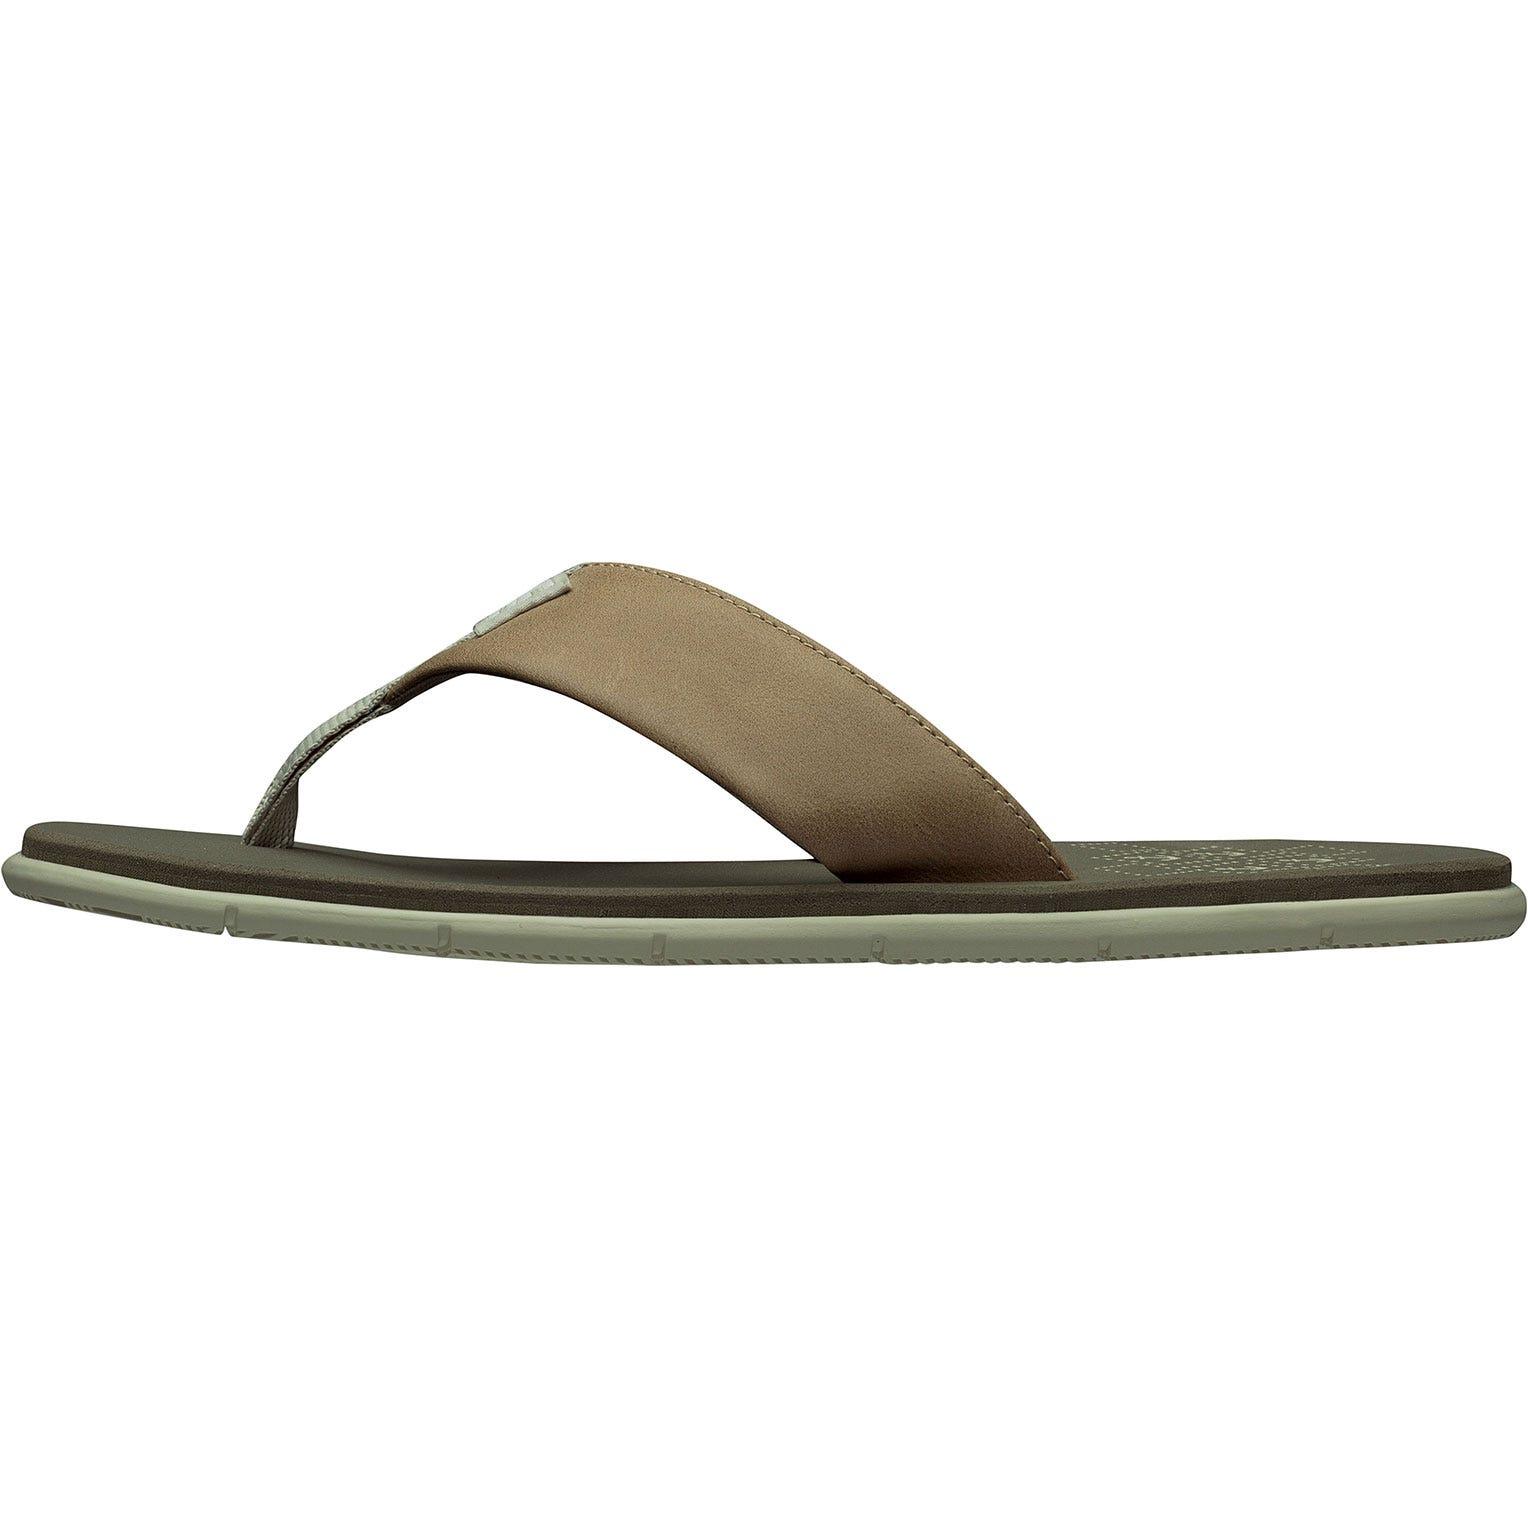 Helly Hansen W Seasand Leather Sandal Womens Beige 37/6